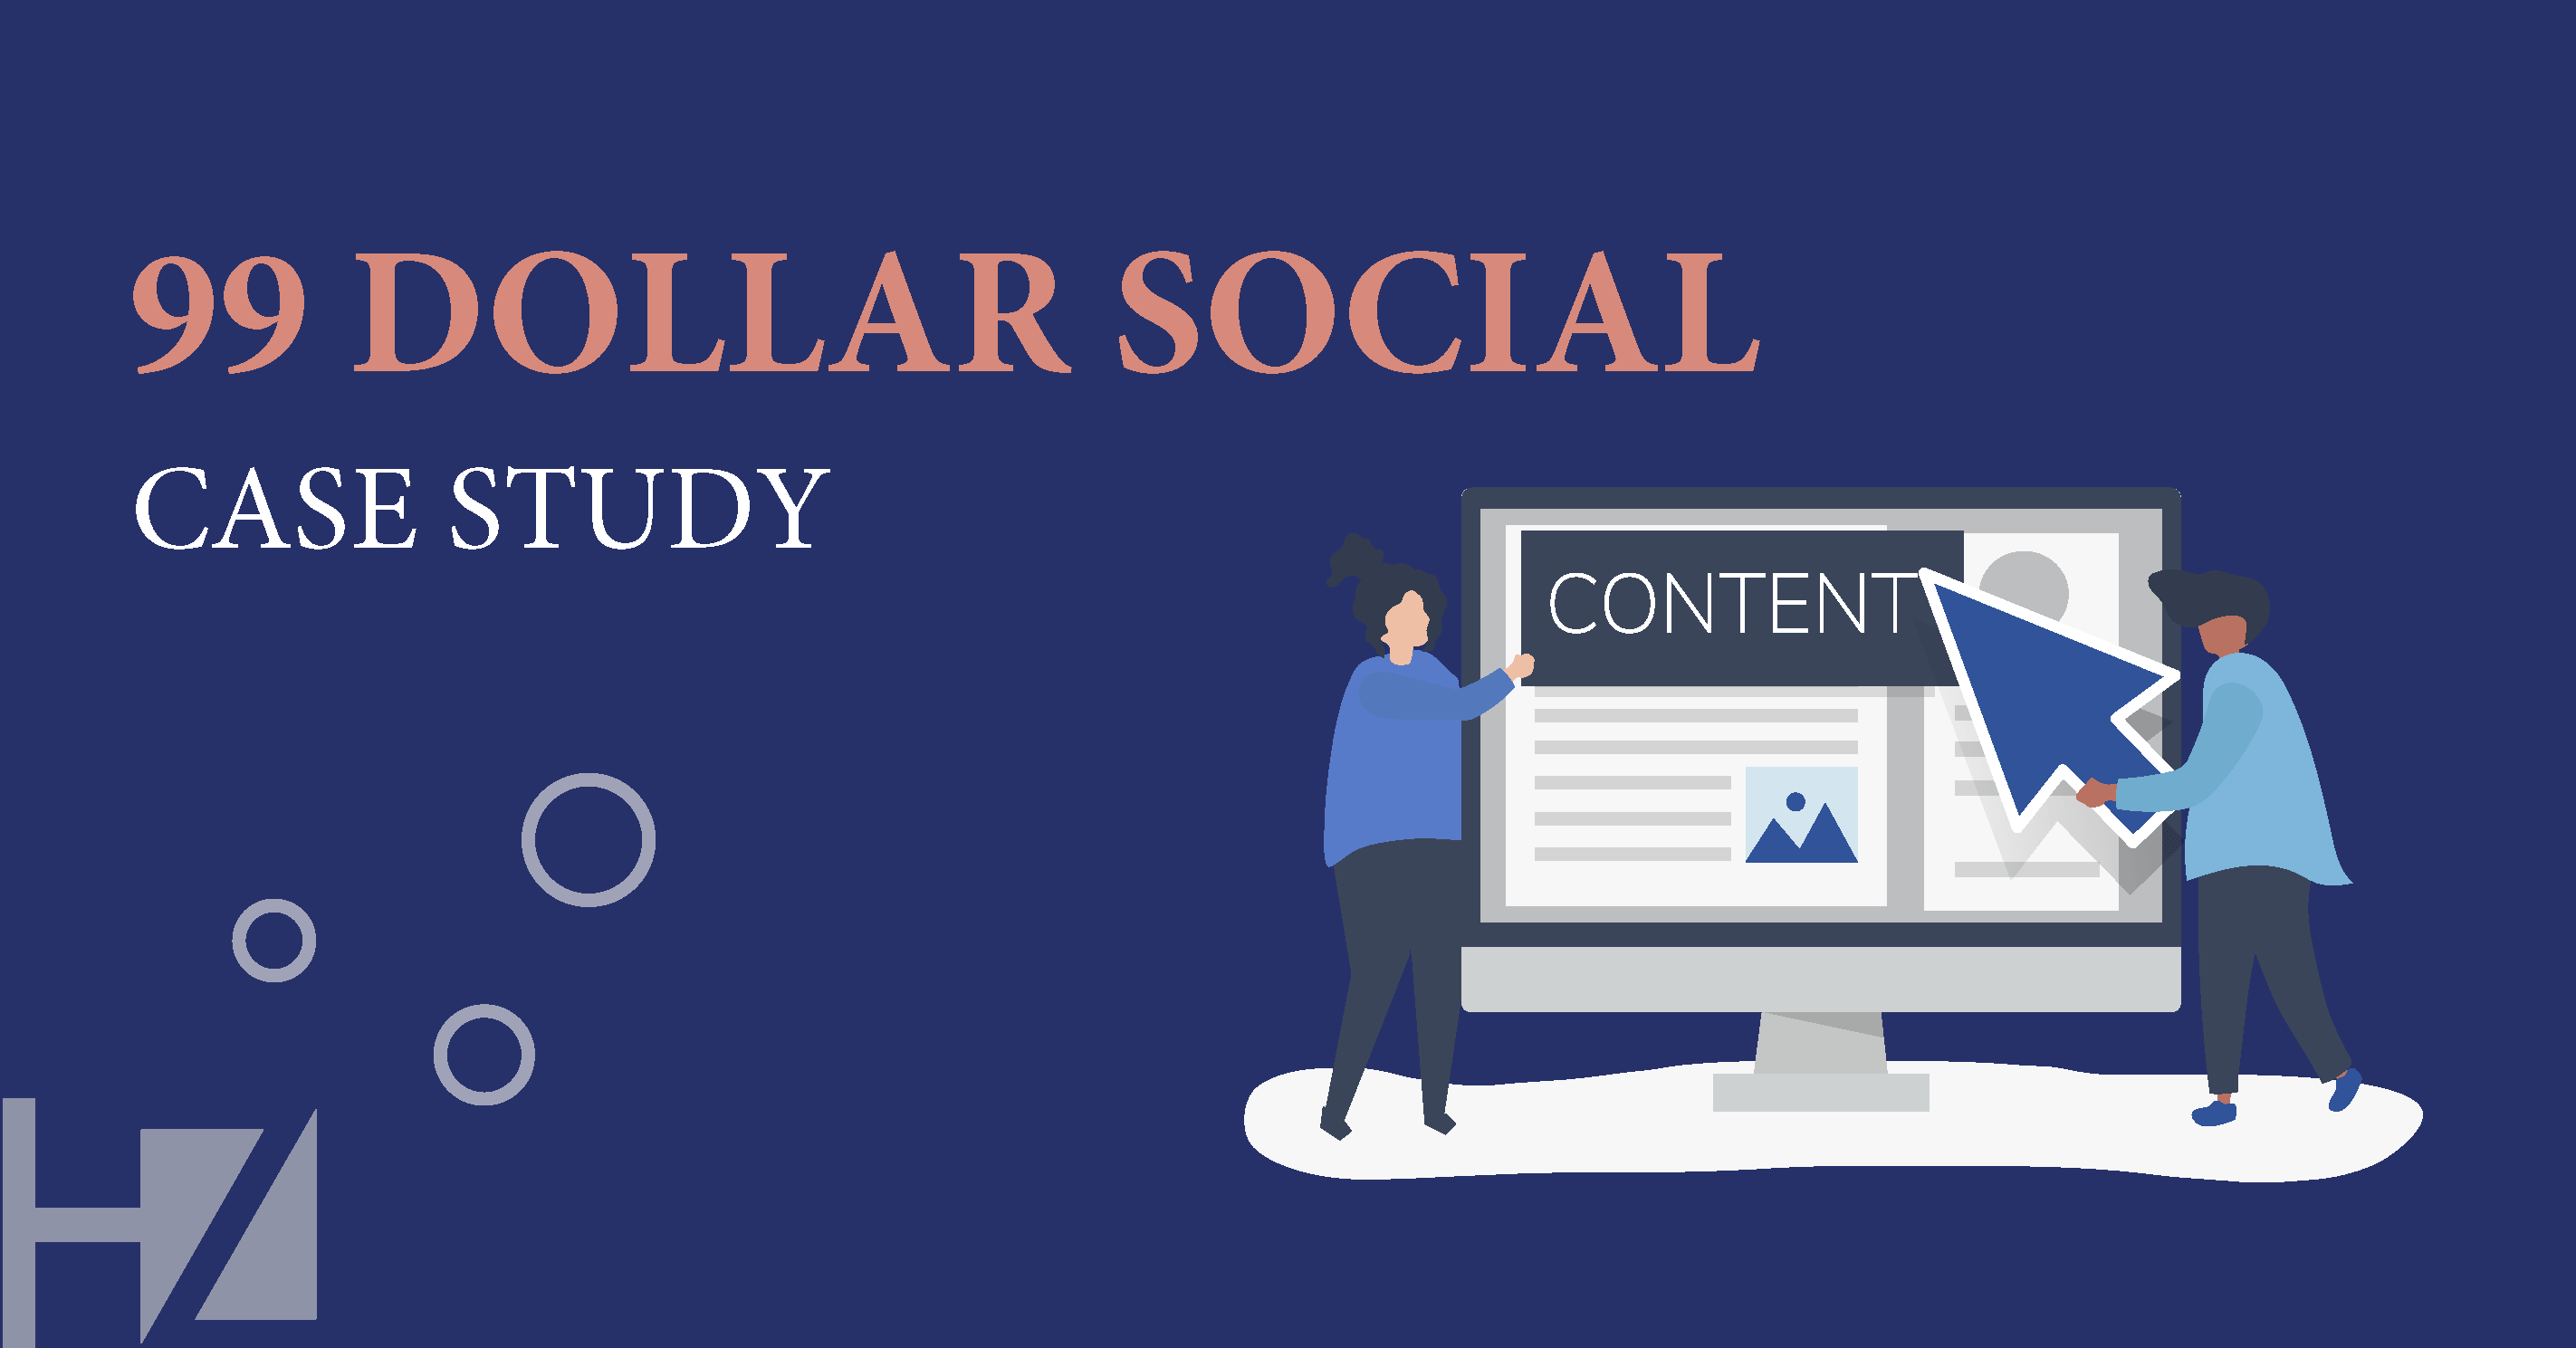 99 Dollar Social Case Study